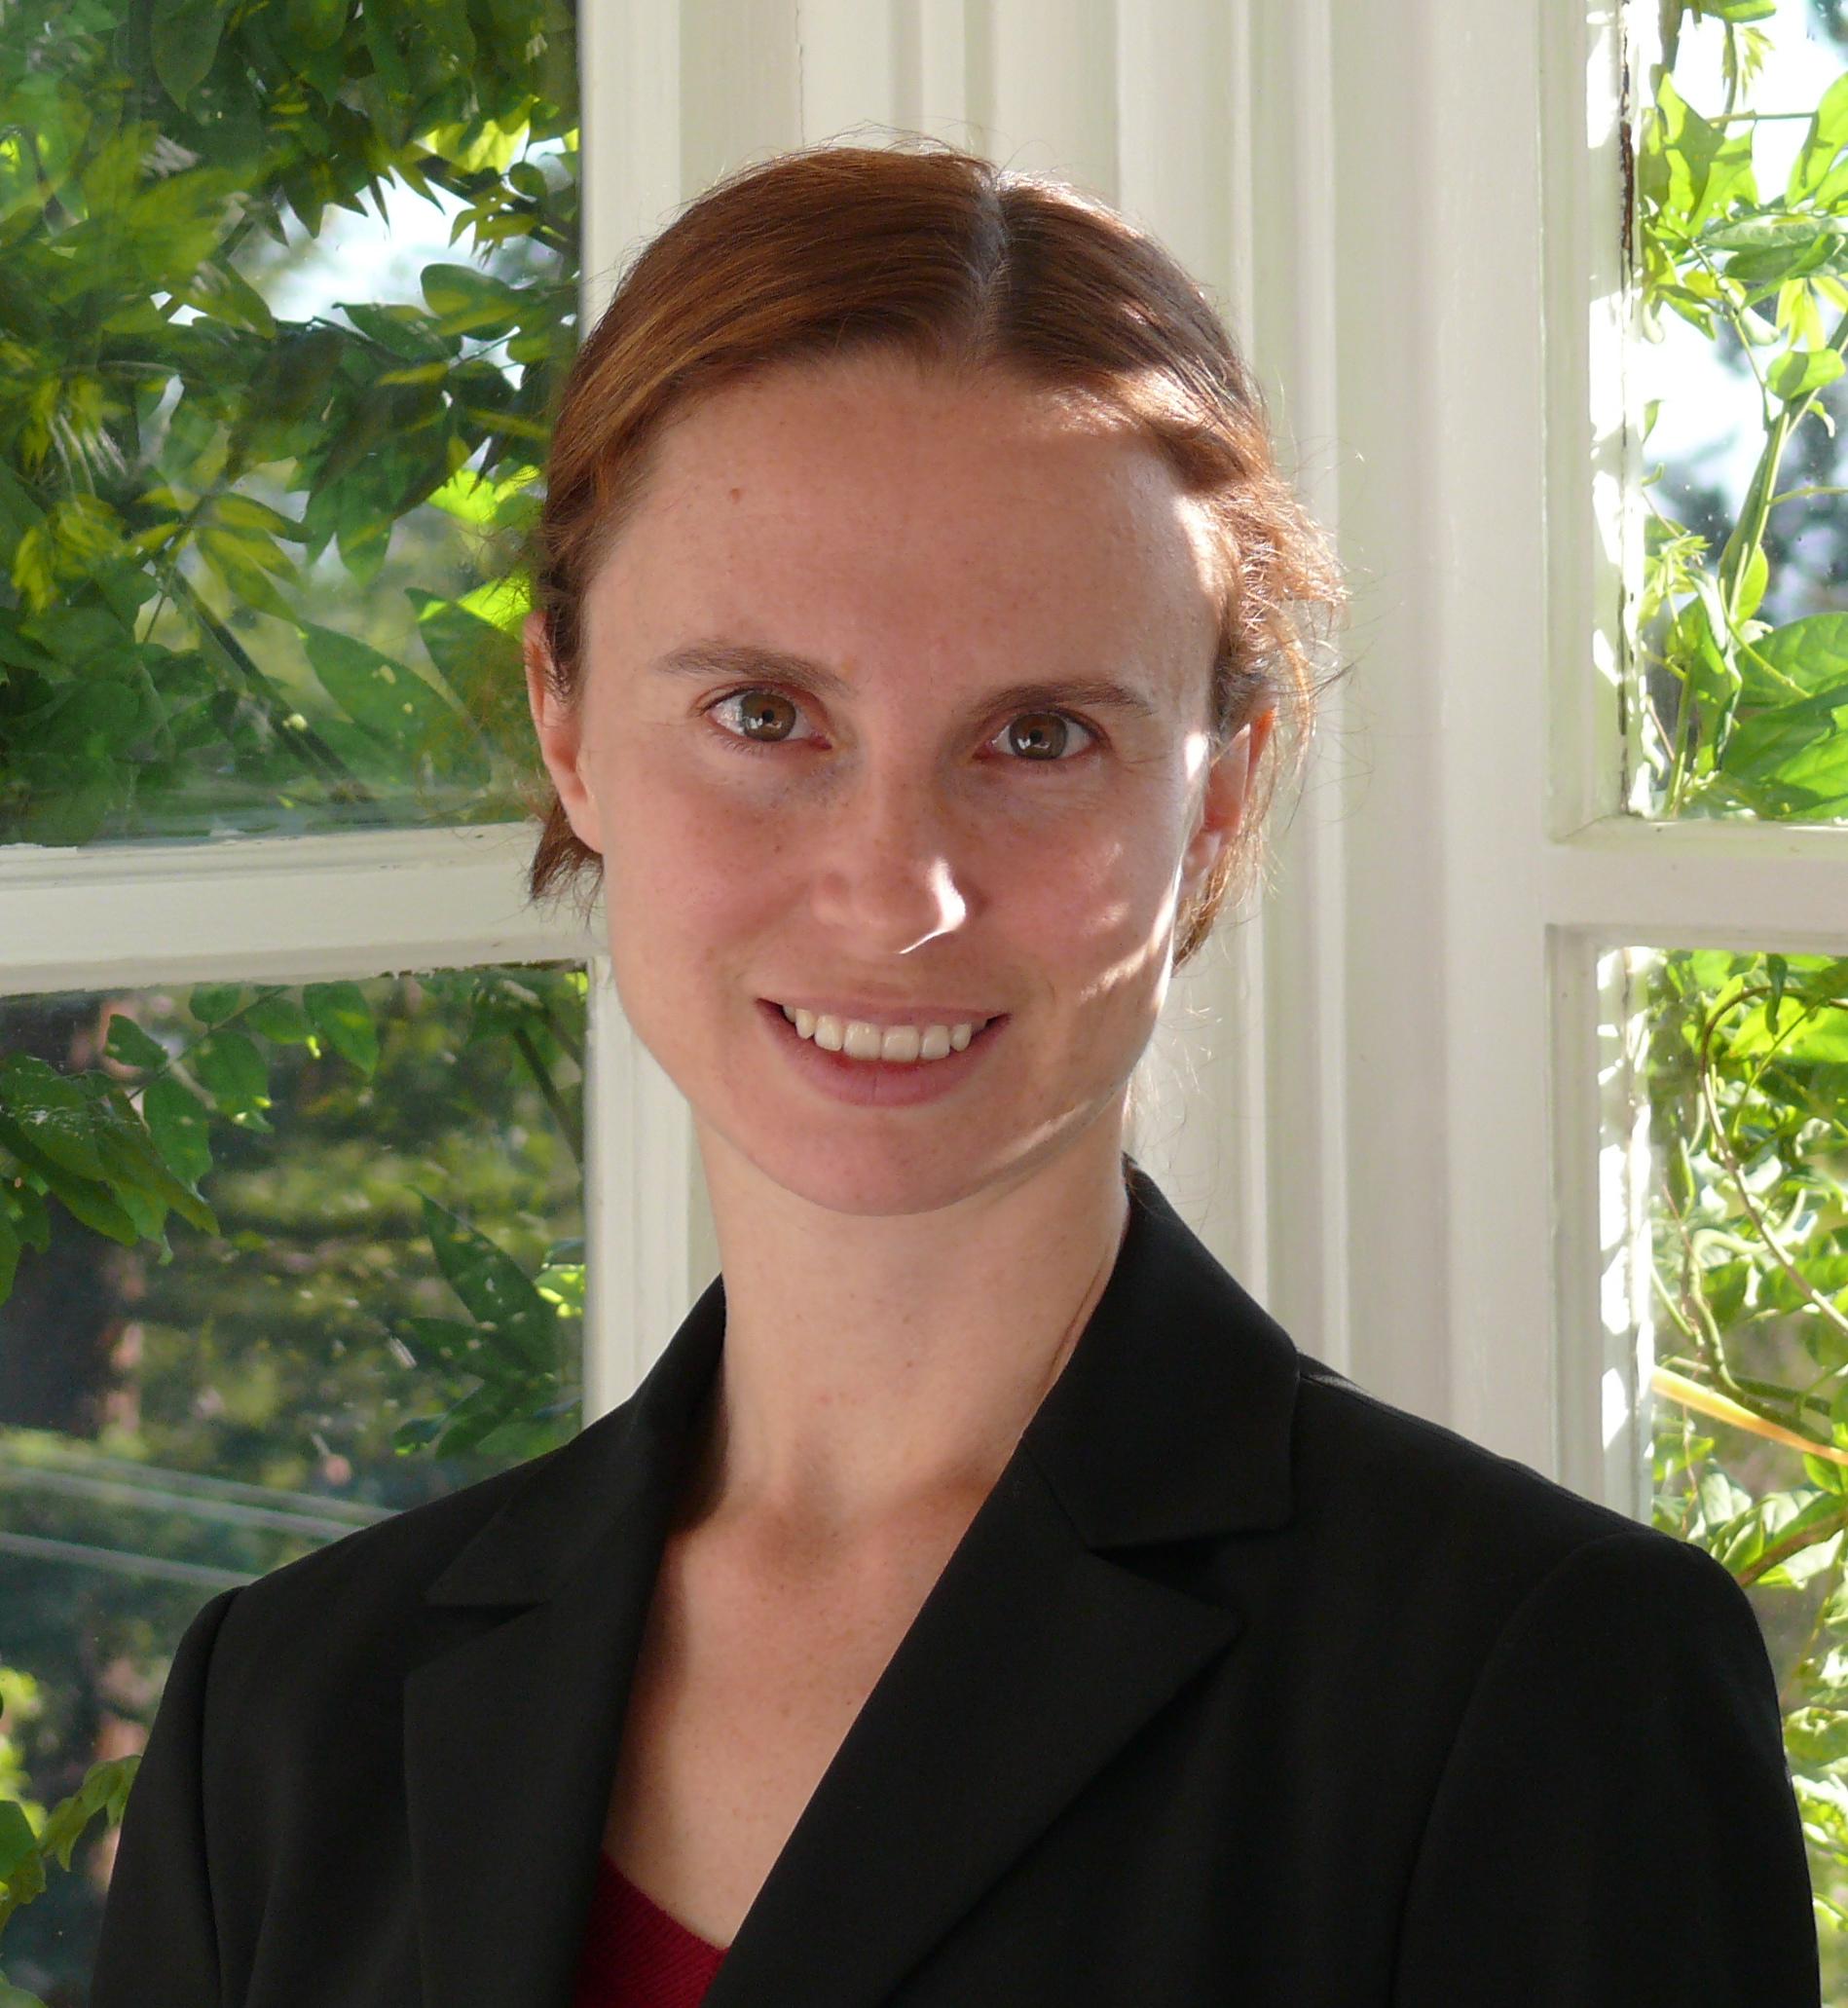 Elizabeth Muller, Exec. Director of Berkeley Earth